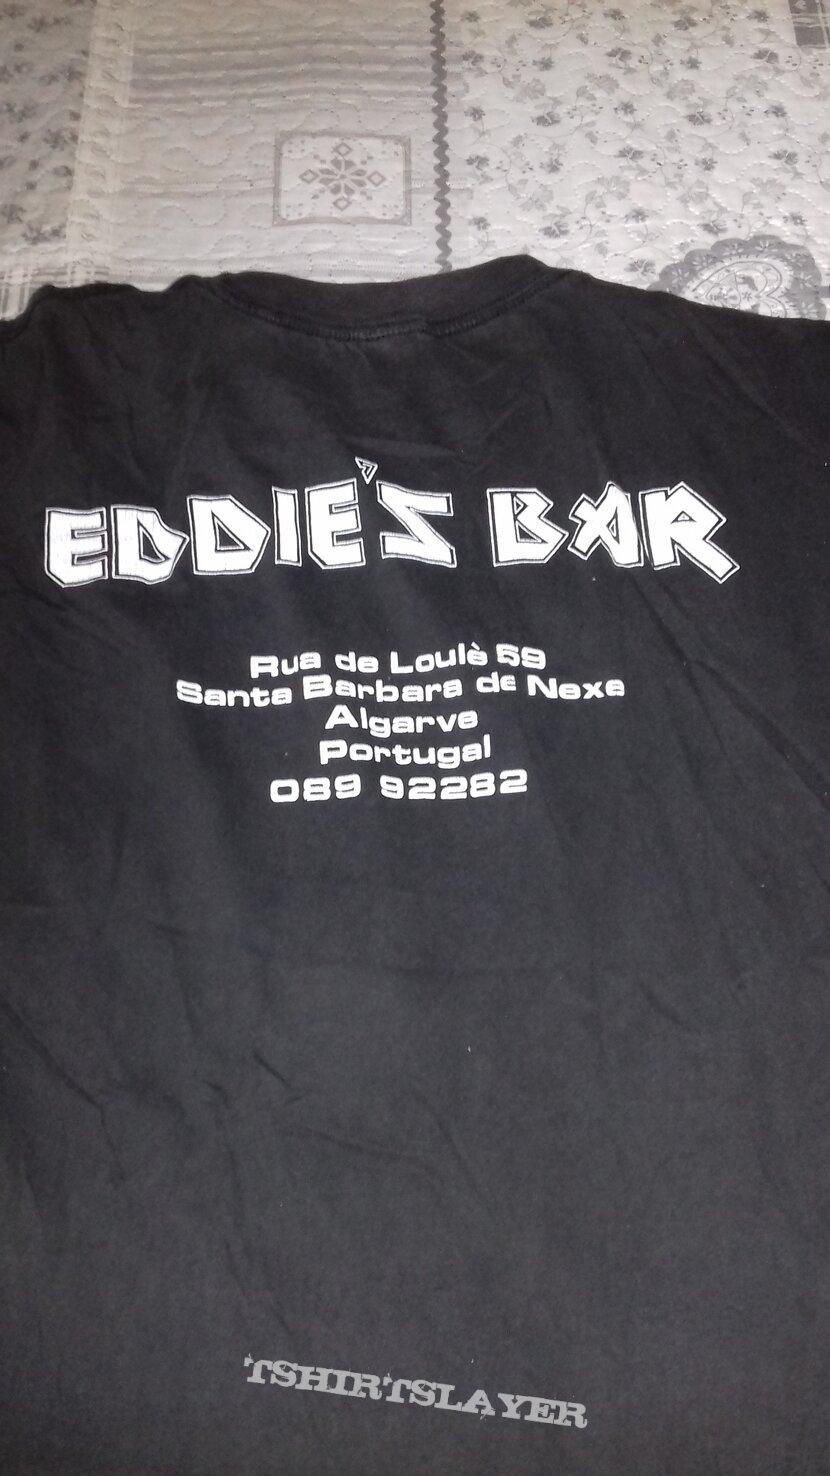 Eddie's Bar Algarve